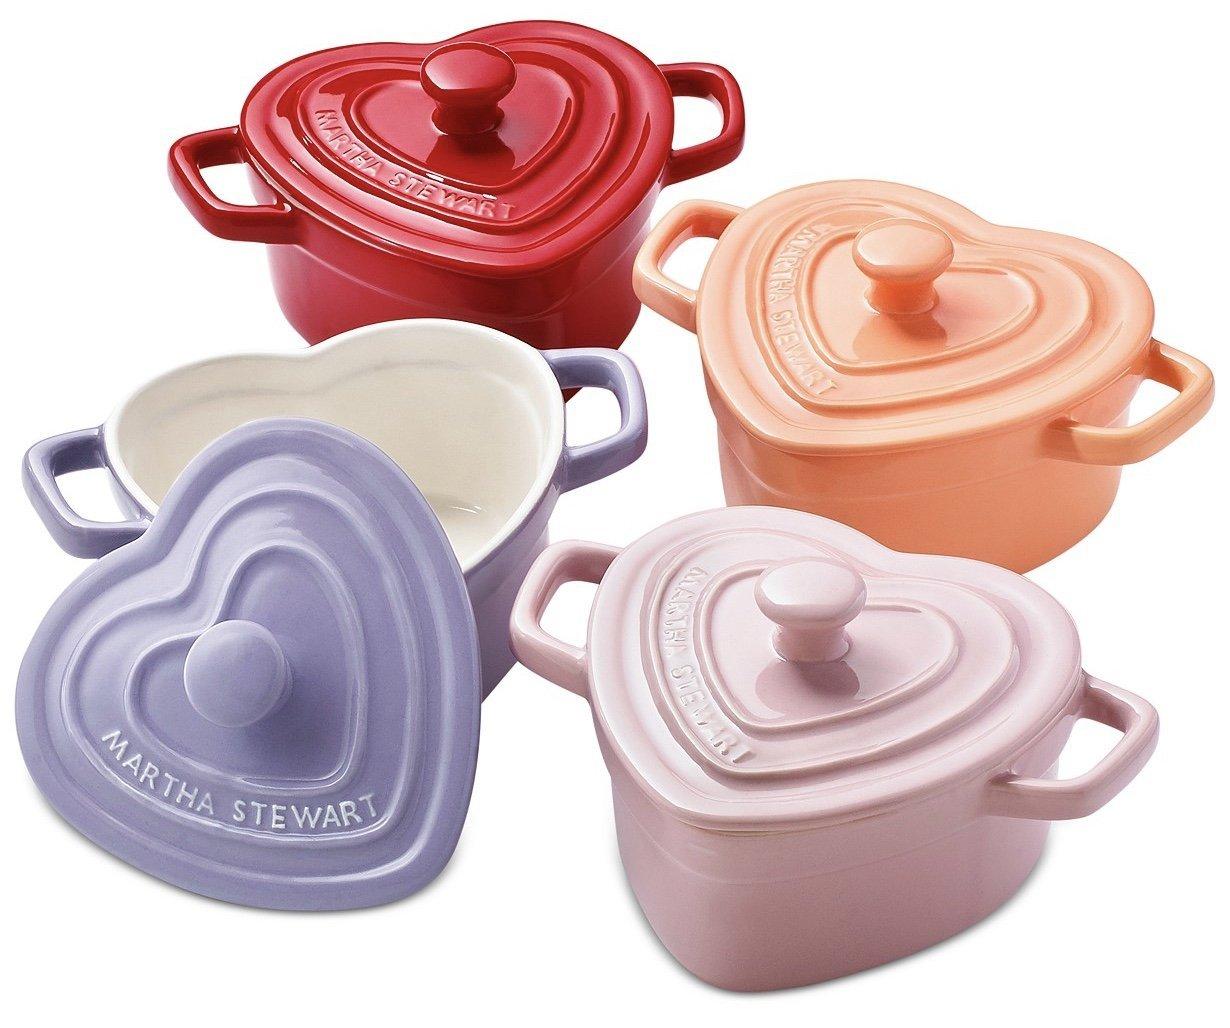 Martha Stewart Collection 4 Pc Heart Cocottes Set, 8oz each